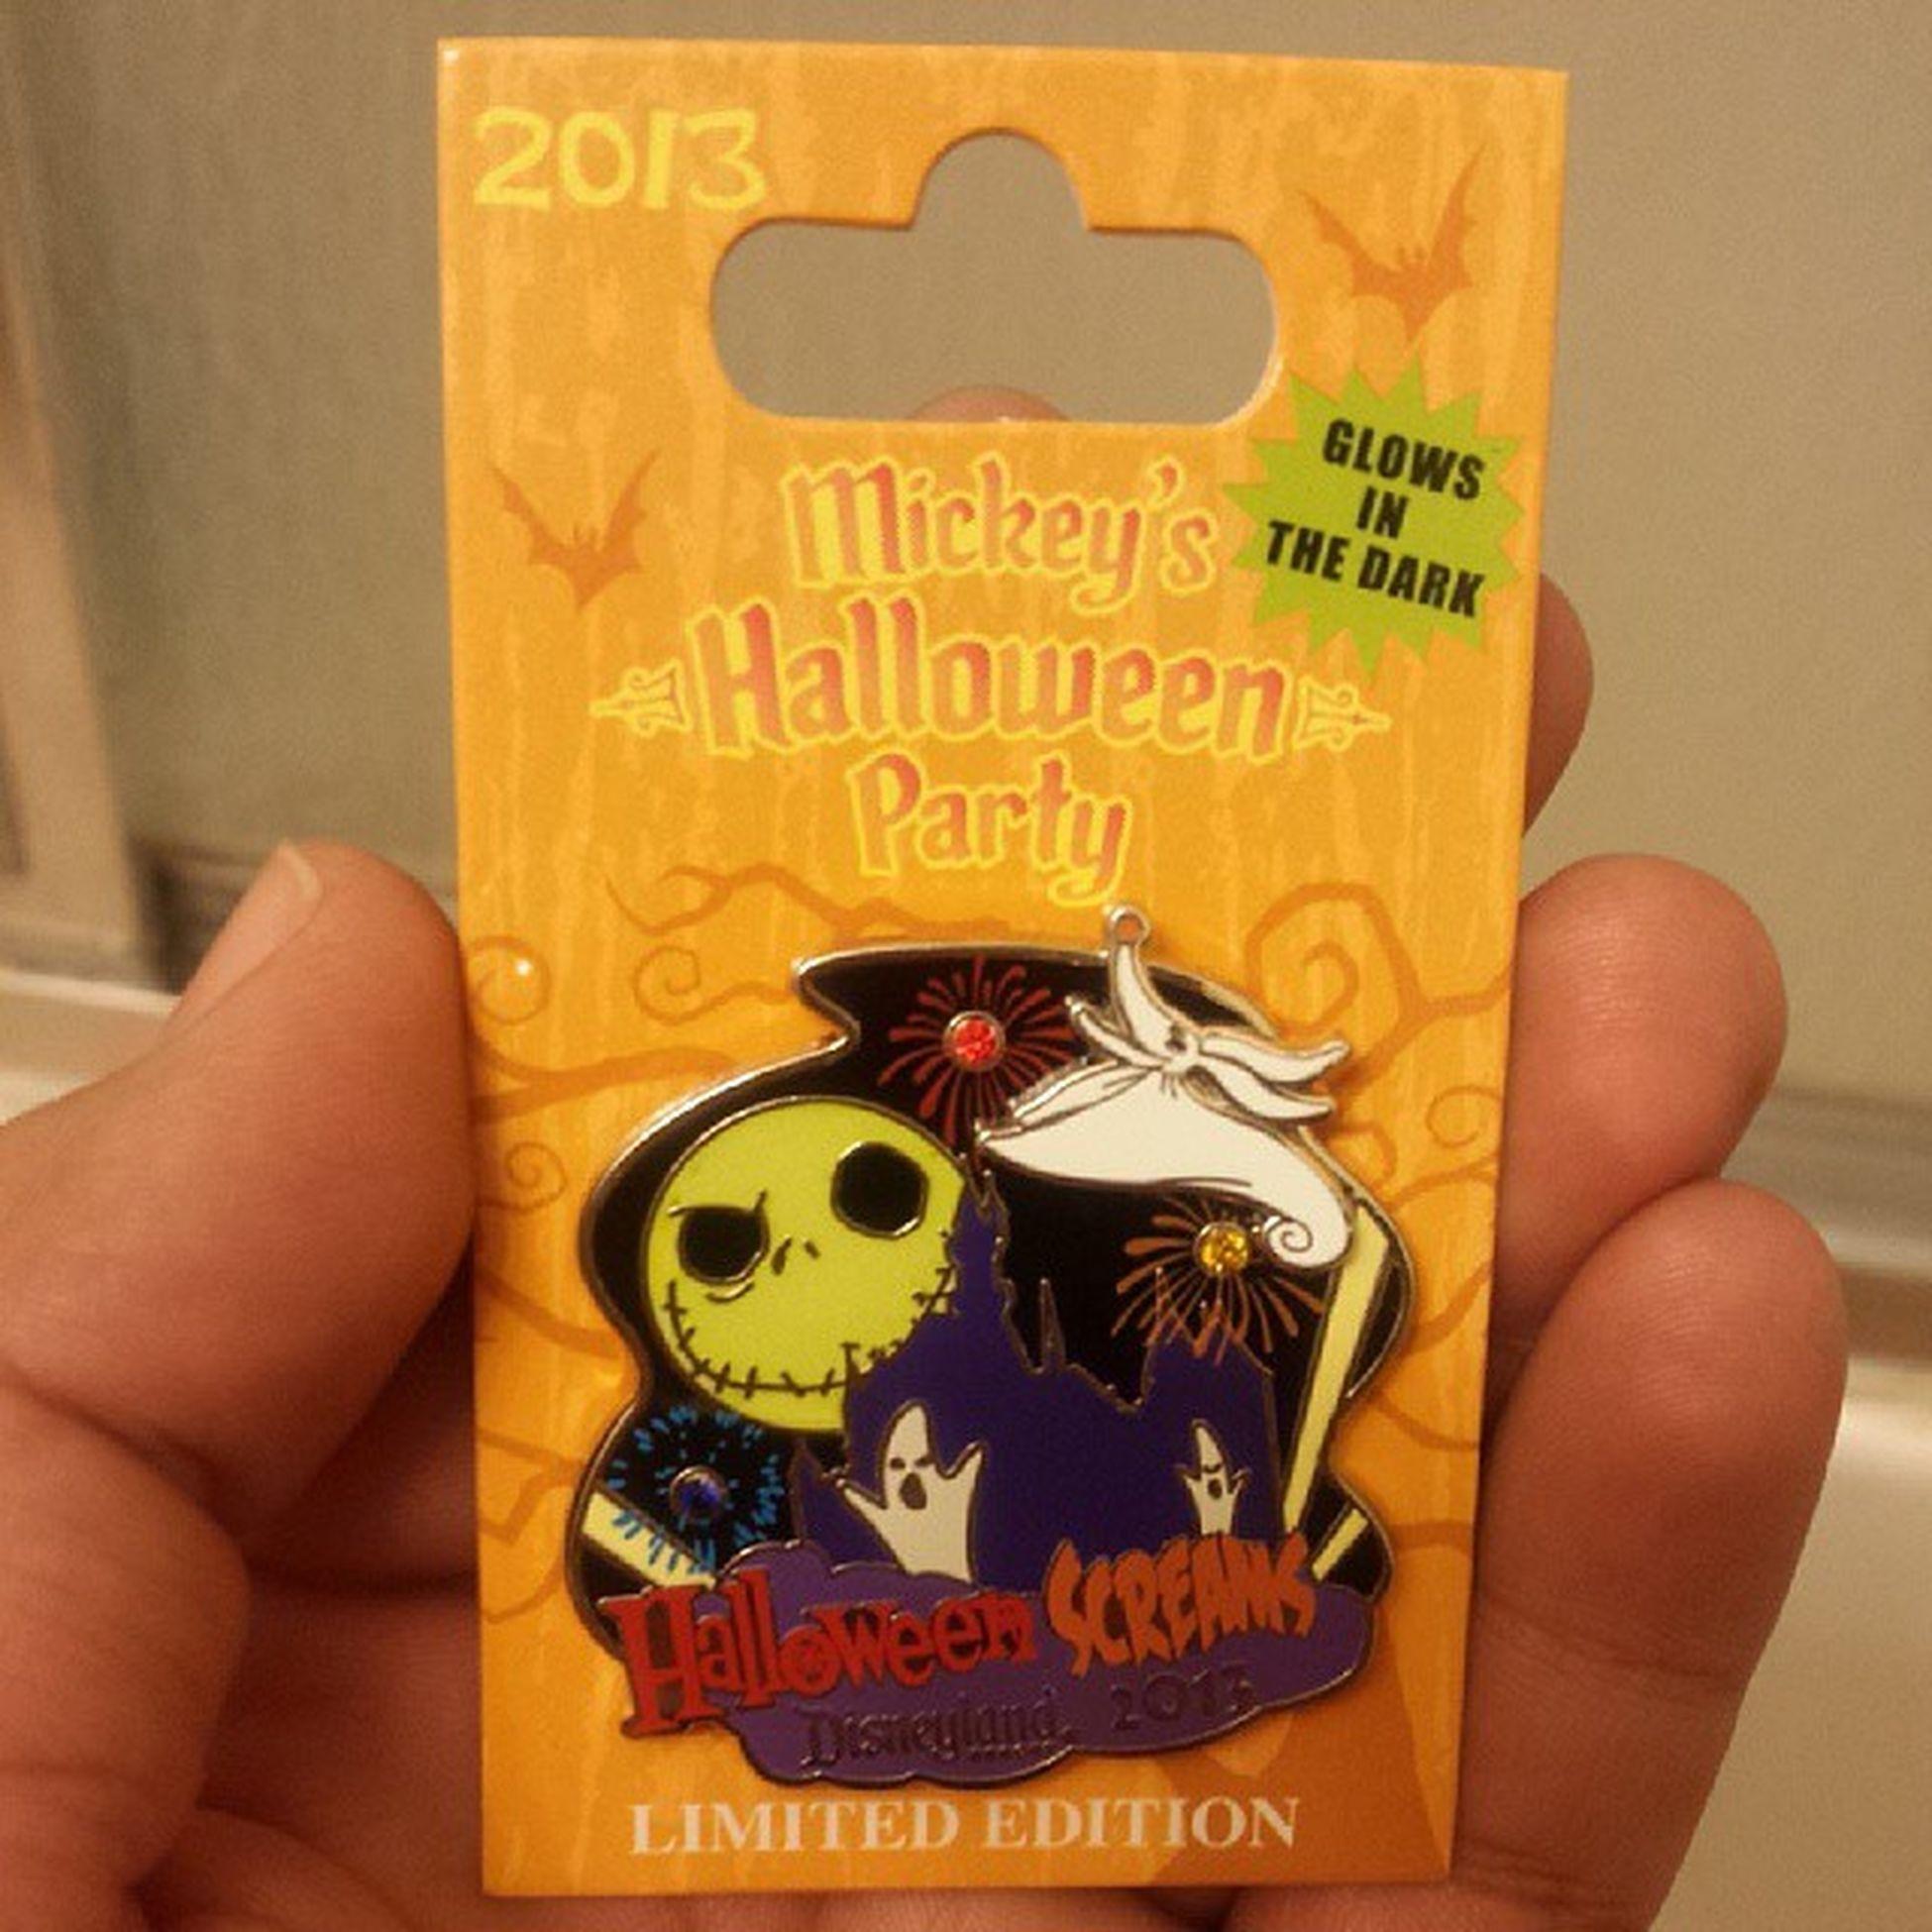 Adding a Limited Edition to the collection. Mickeyshalloweenparty Disney Halloweenscreams Pincollector disneyland familytime @disneylandpost @disneylandaily photooftheday tagsforlikes seasonpassholders